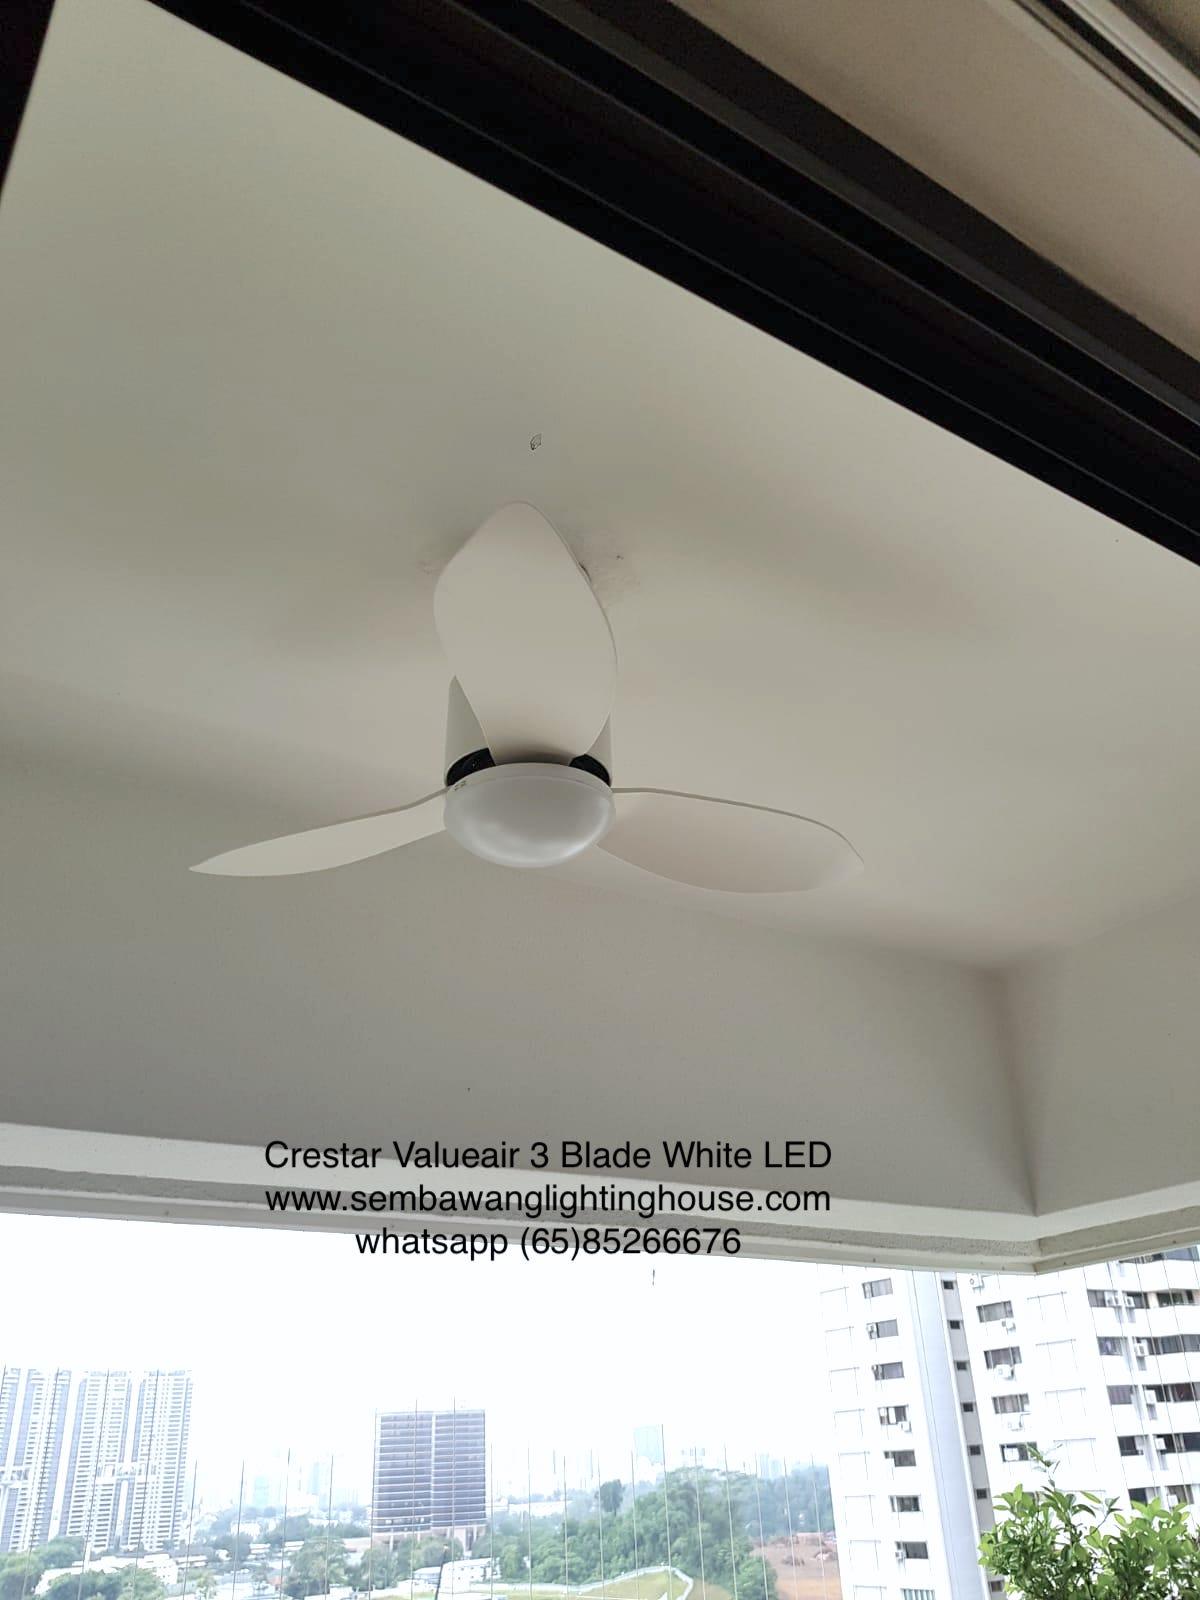 crestar-valueair-3-blade-white-ceiling-fan-sample installed on condominium balcony